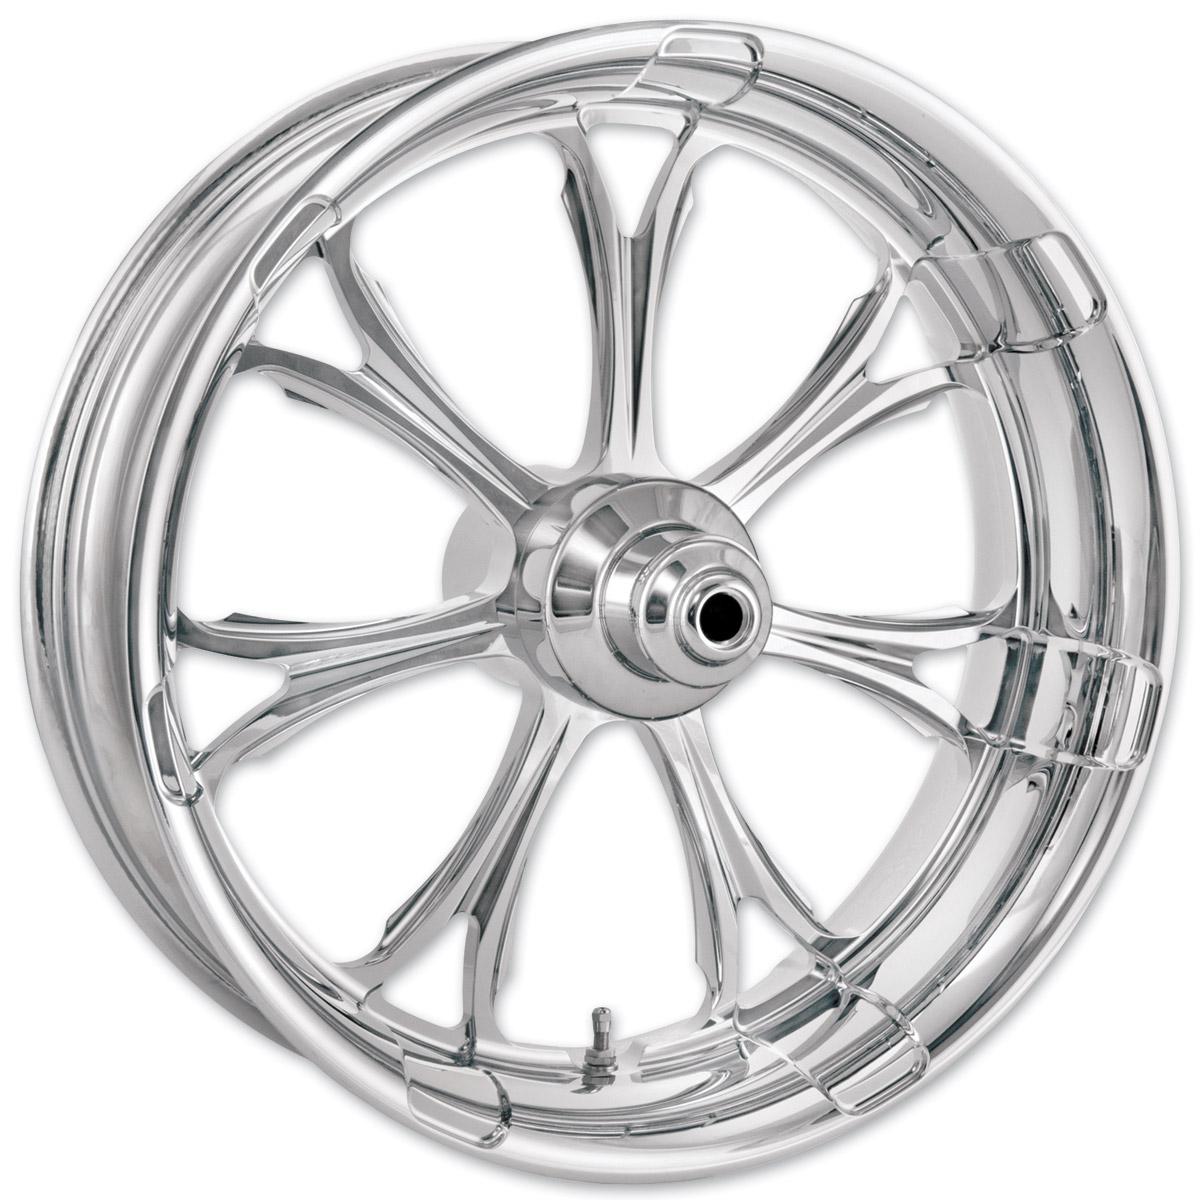 Performance Machine Paramount Chrome Front Wheel, 21″ X 3.5″